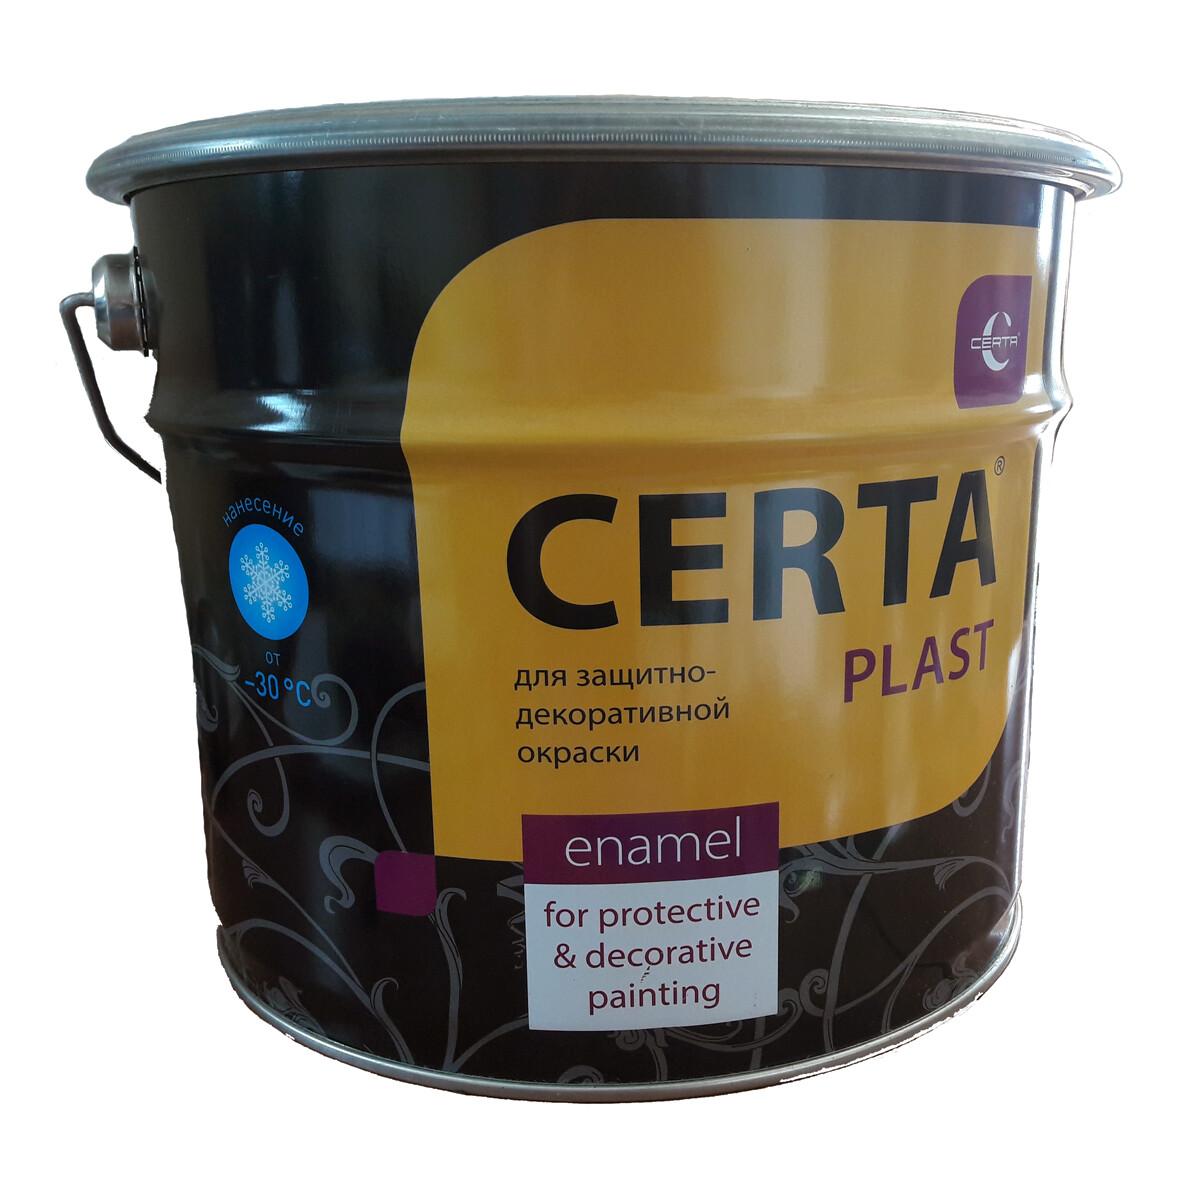 Грунт Церта-Пласт песочно-желтый 10 кг